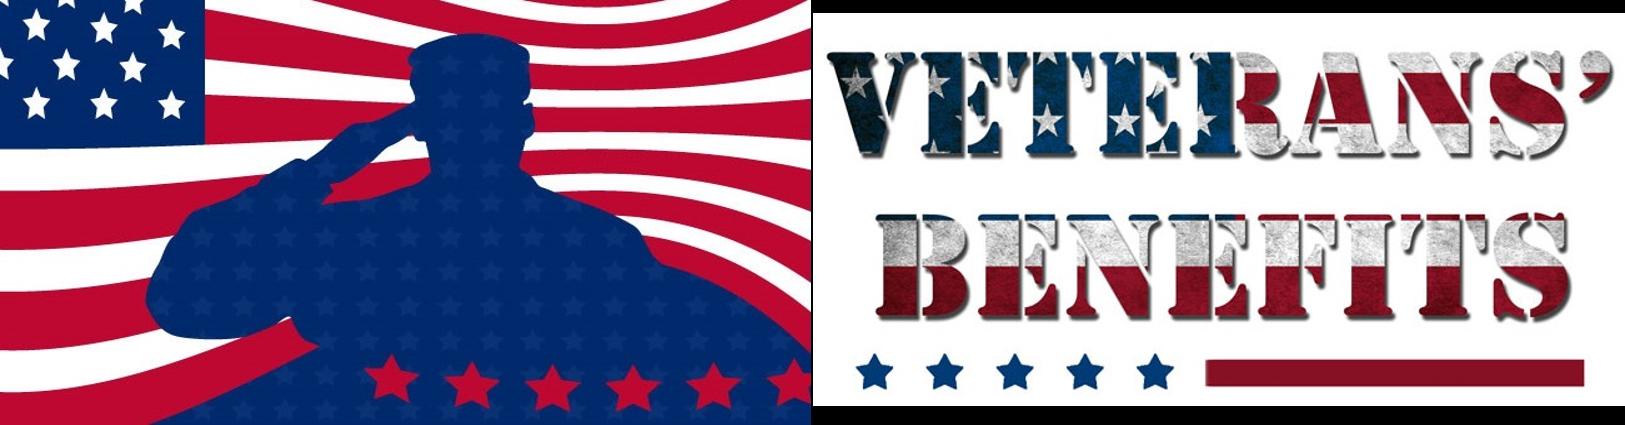 Veterans Benefits.png